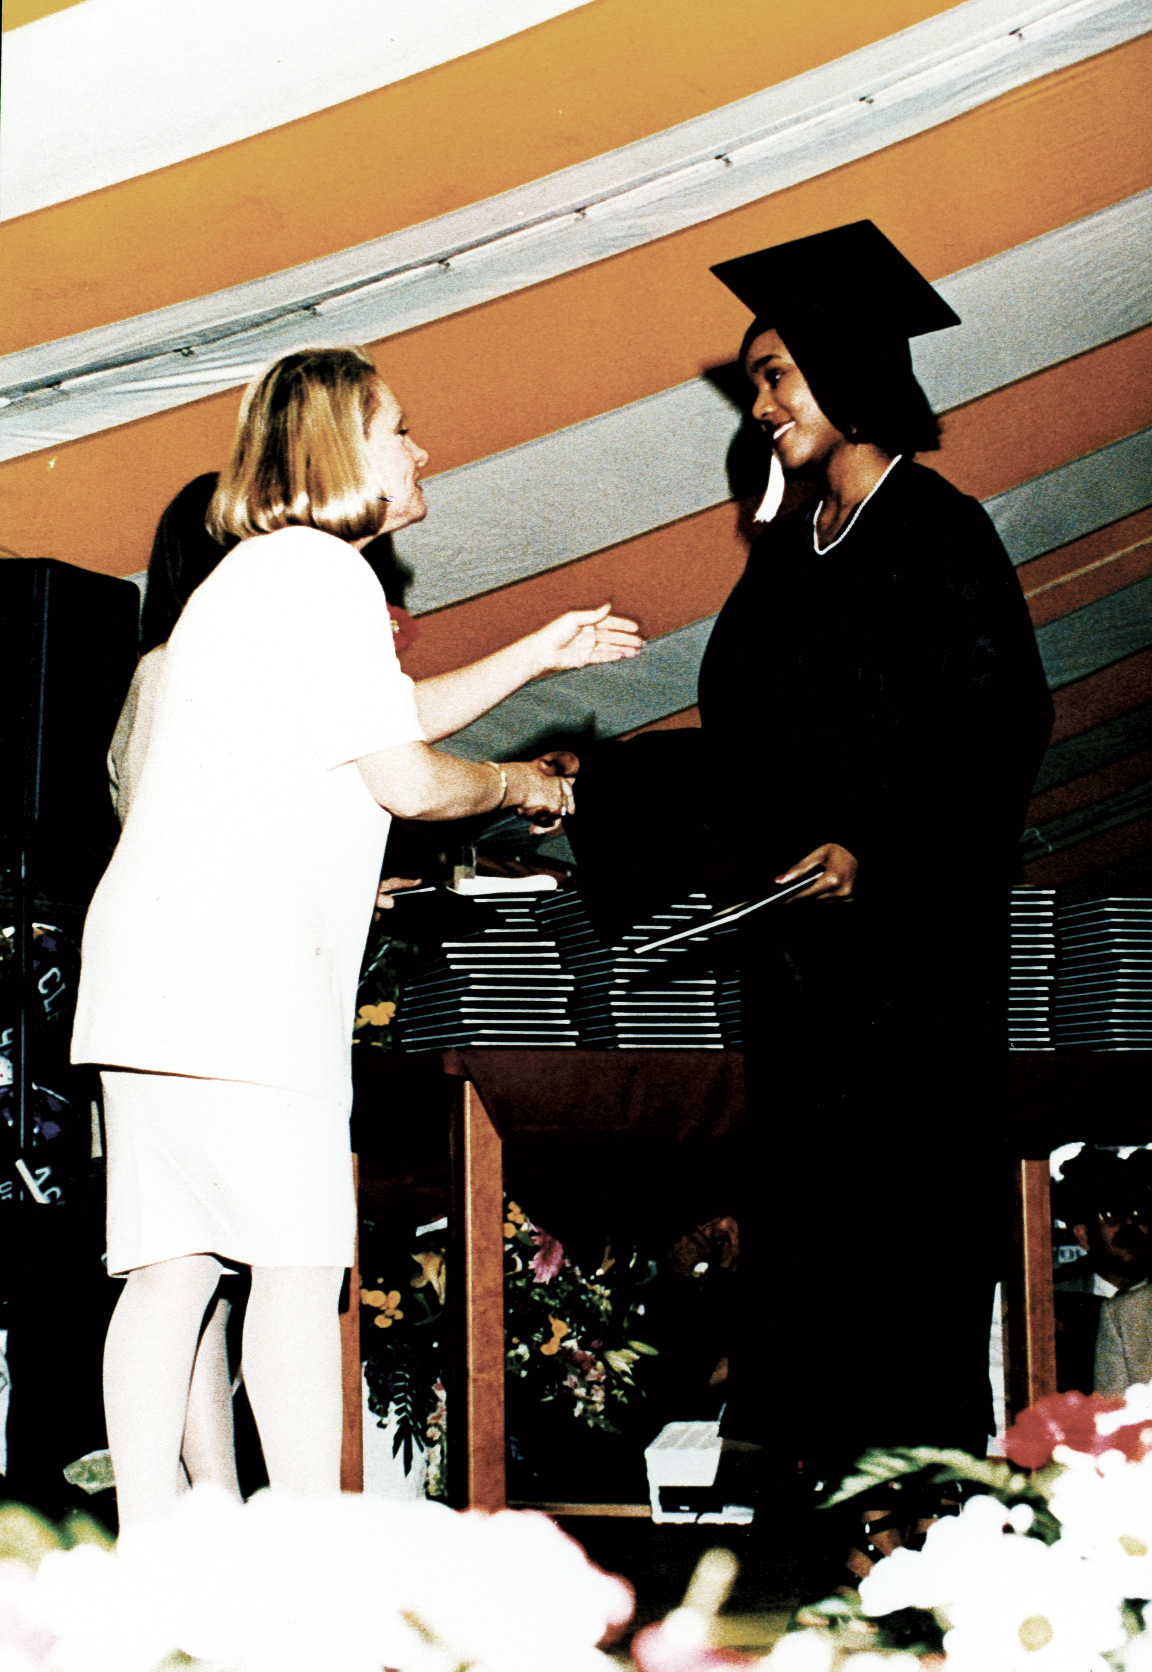 Kira graduation